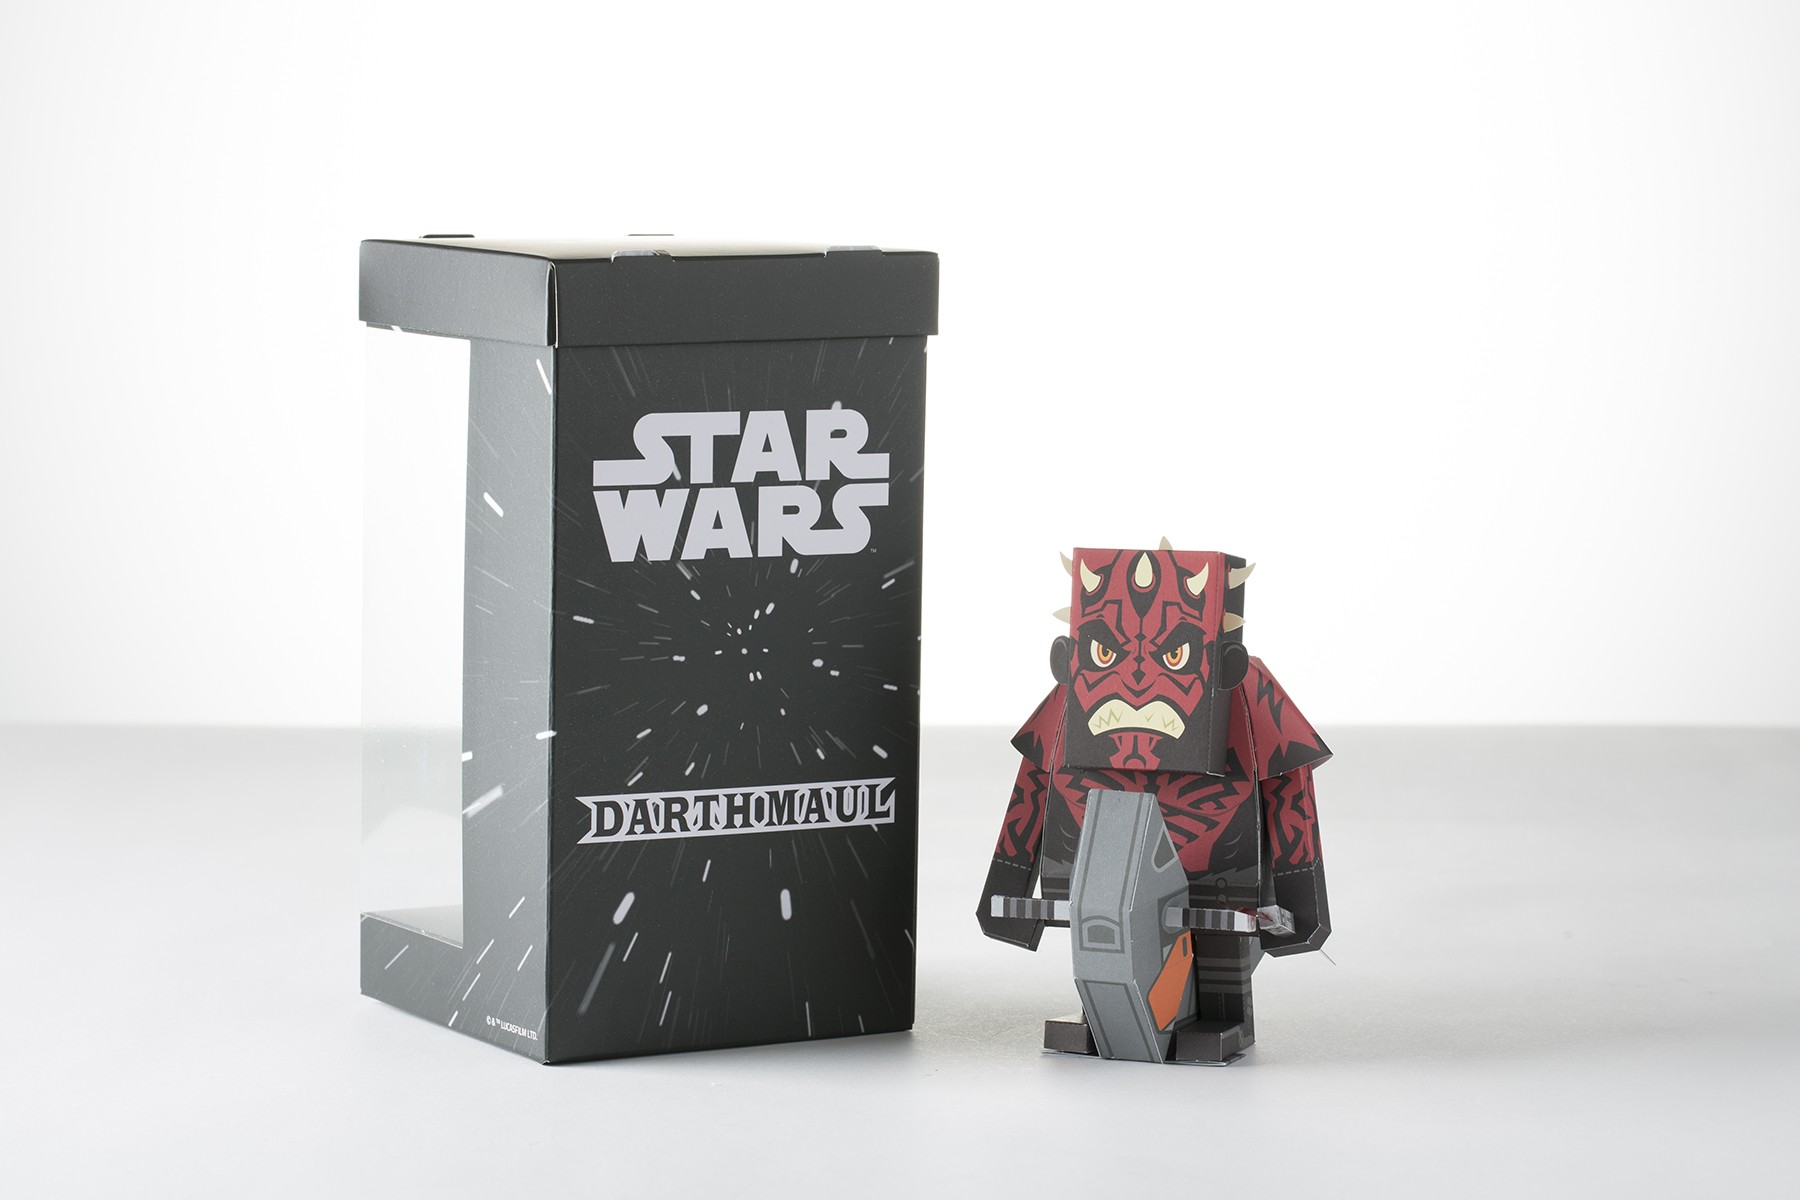 paper_toy_star_wars_darth_maul_momot_market_2